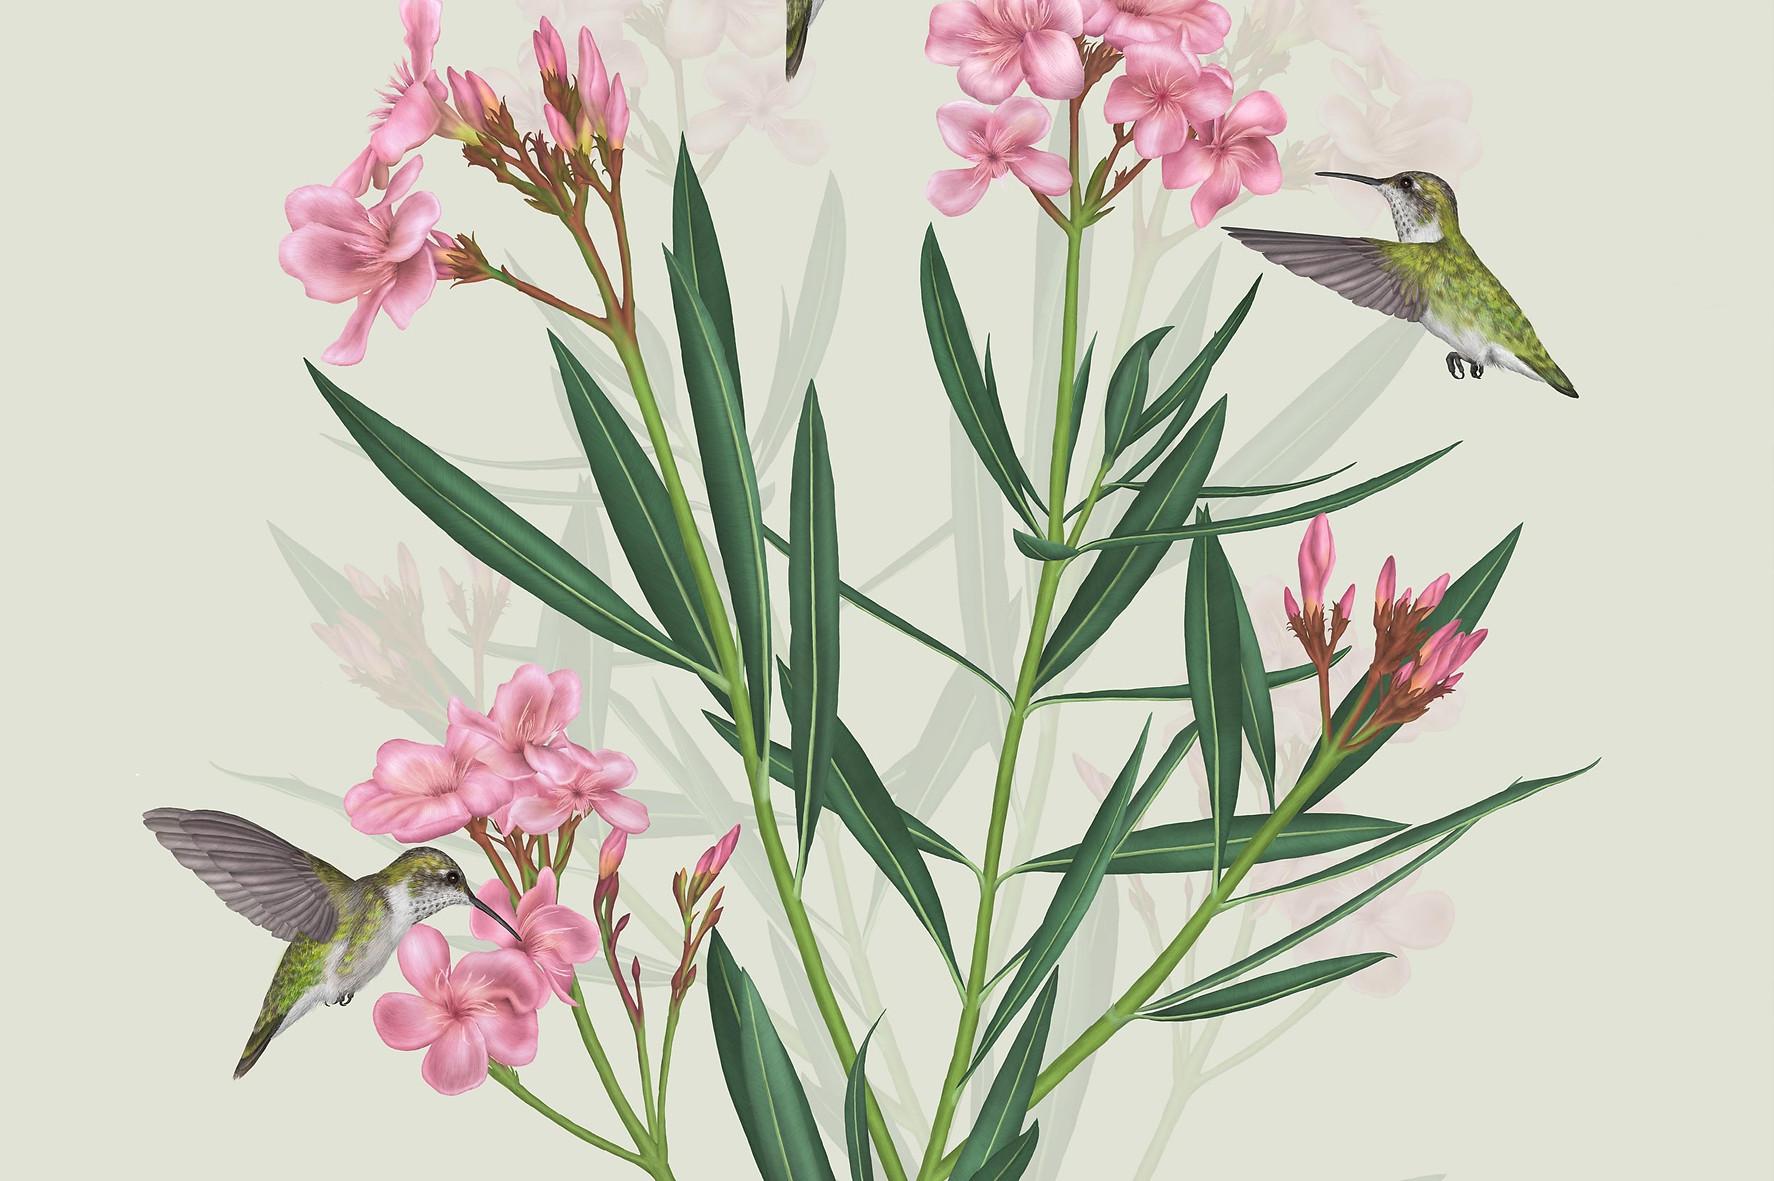 oleander-kolibriky-03.jpg